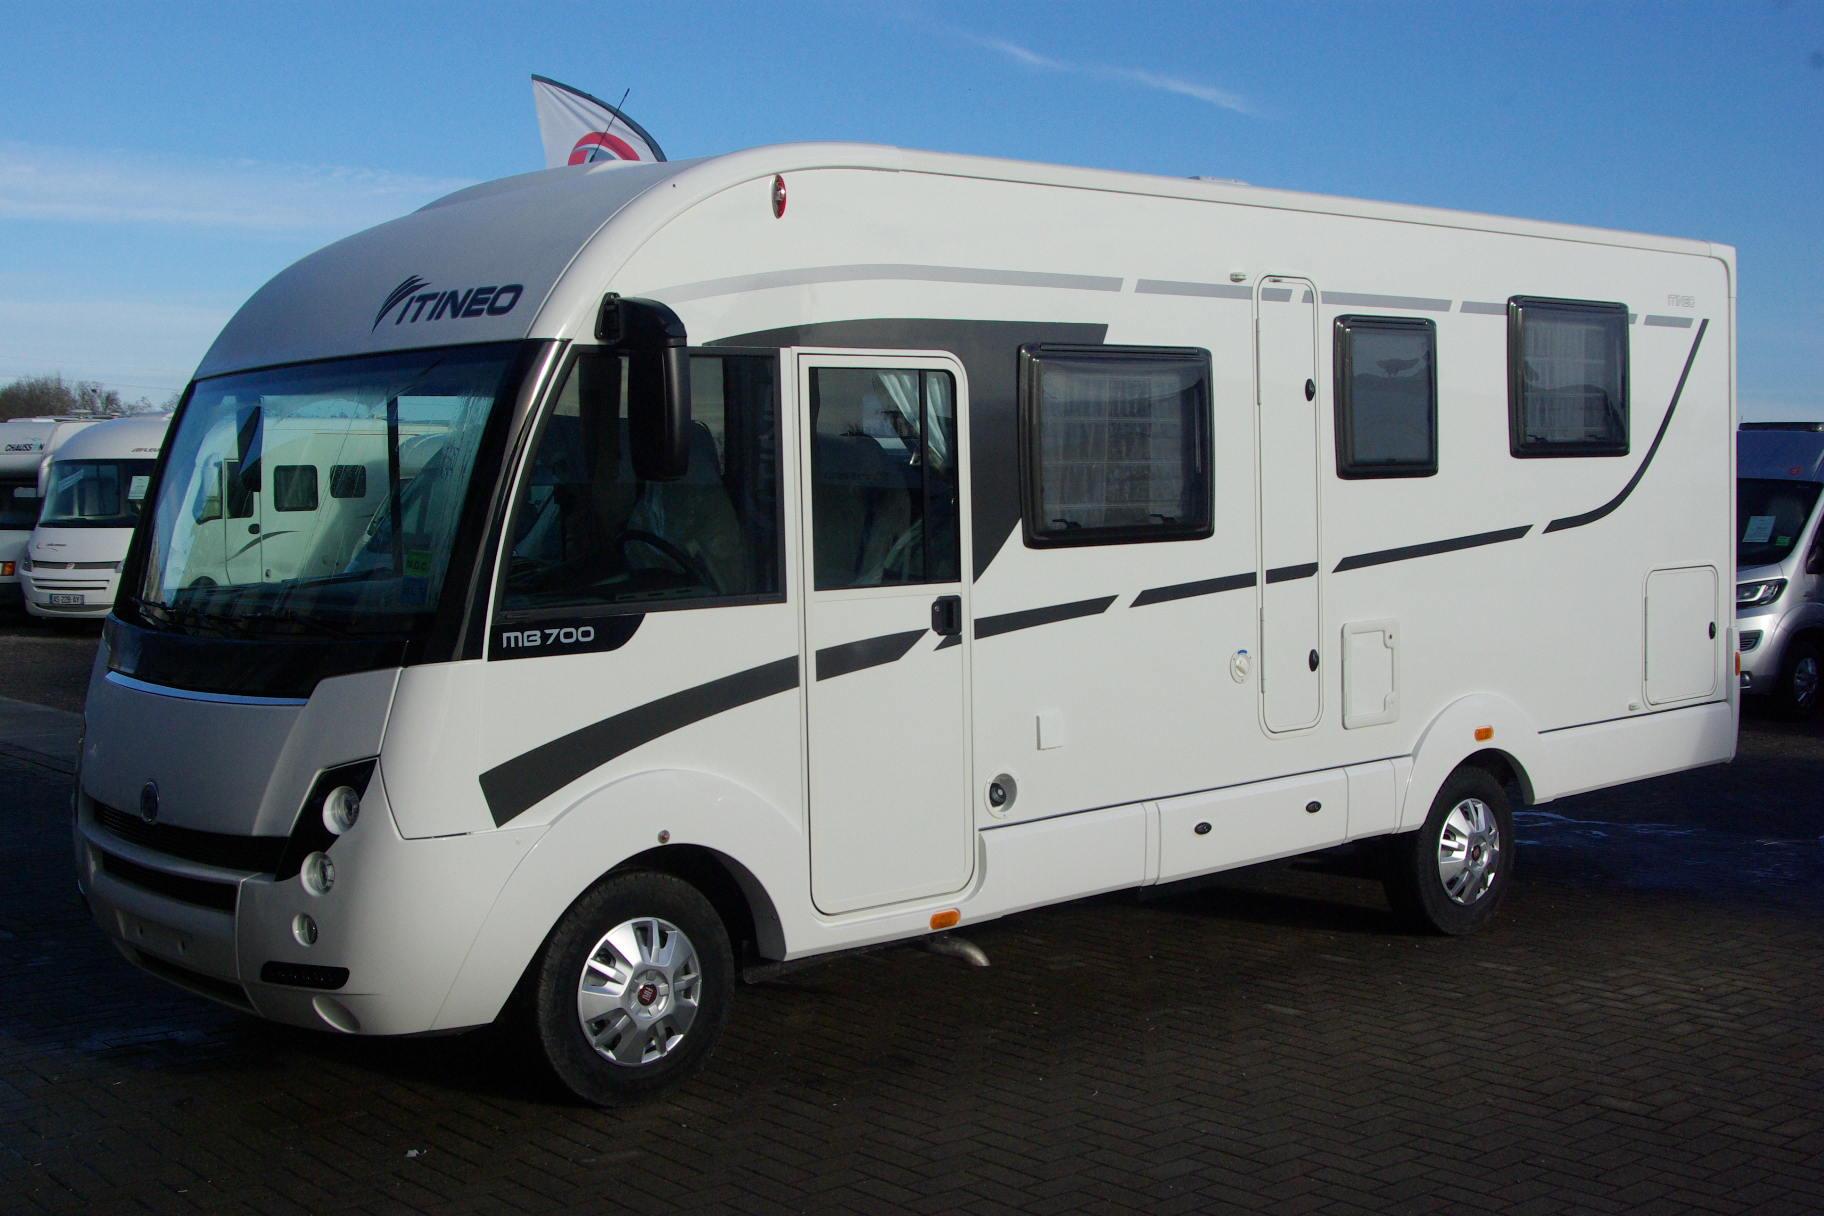 itineo mb 700 neuf porteur fiat 2 3l 130cv camping car vendre en rhin 67 ref 55093. Black Bedroom Furniture Sets. Home Design Ideas